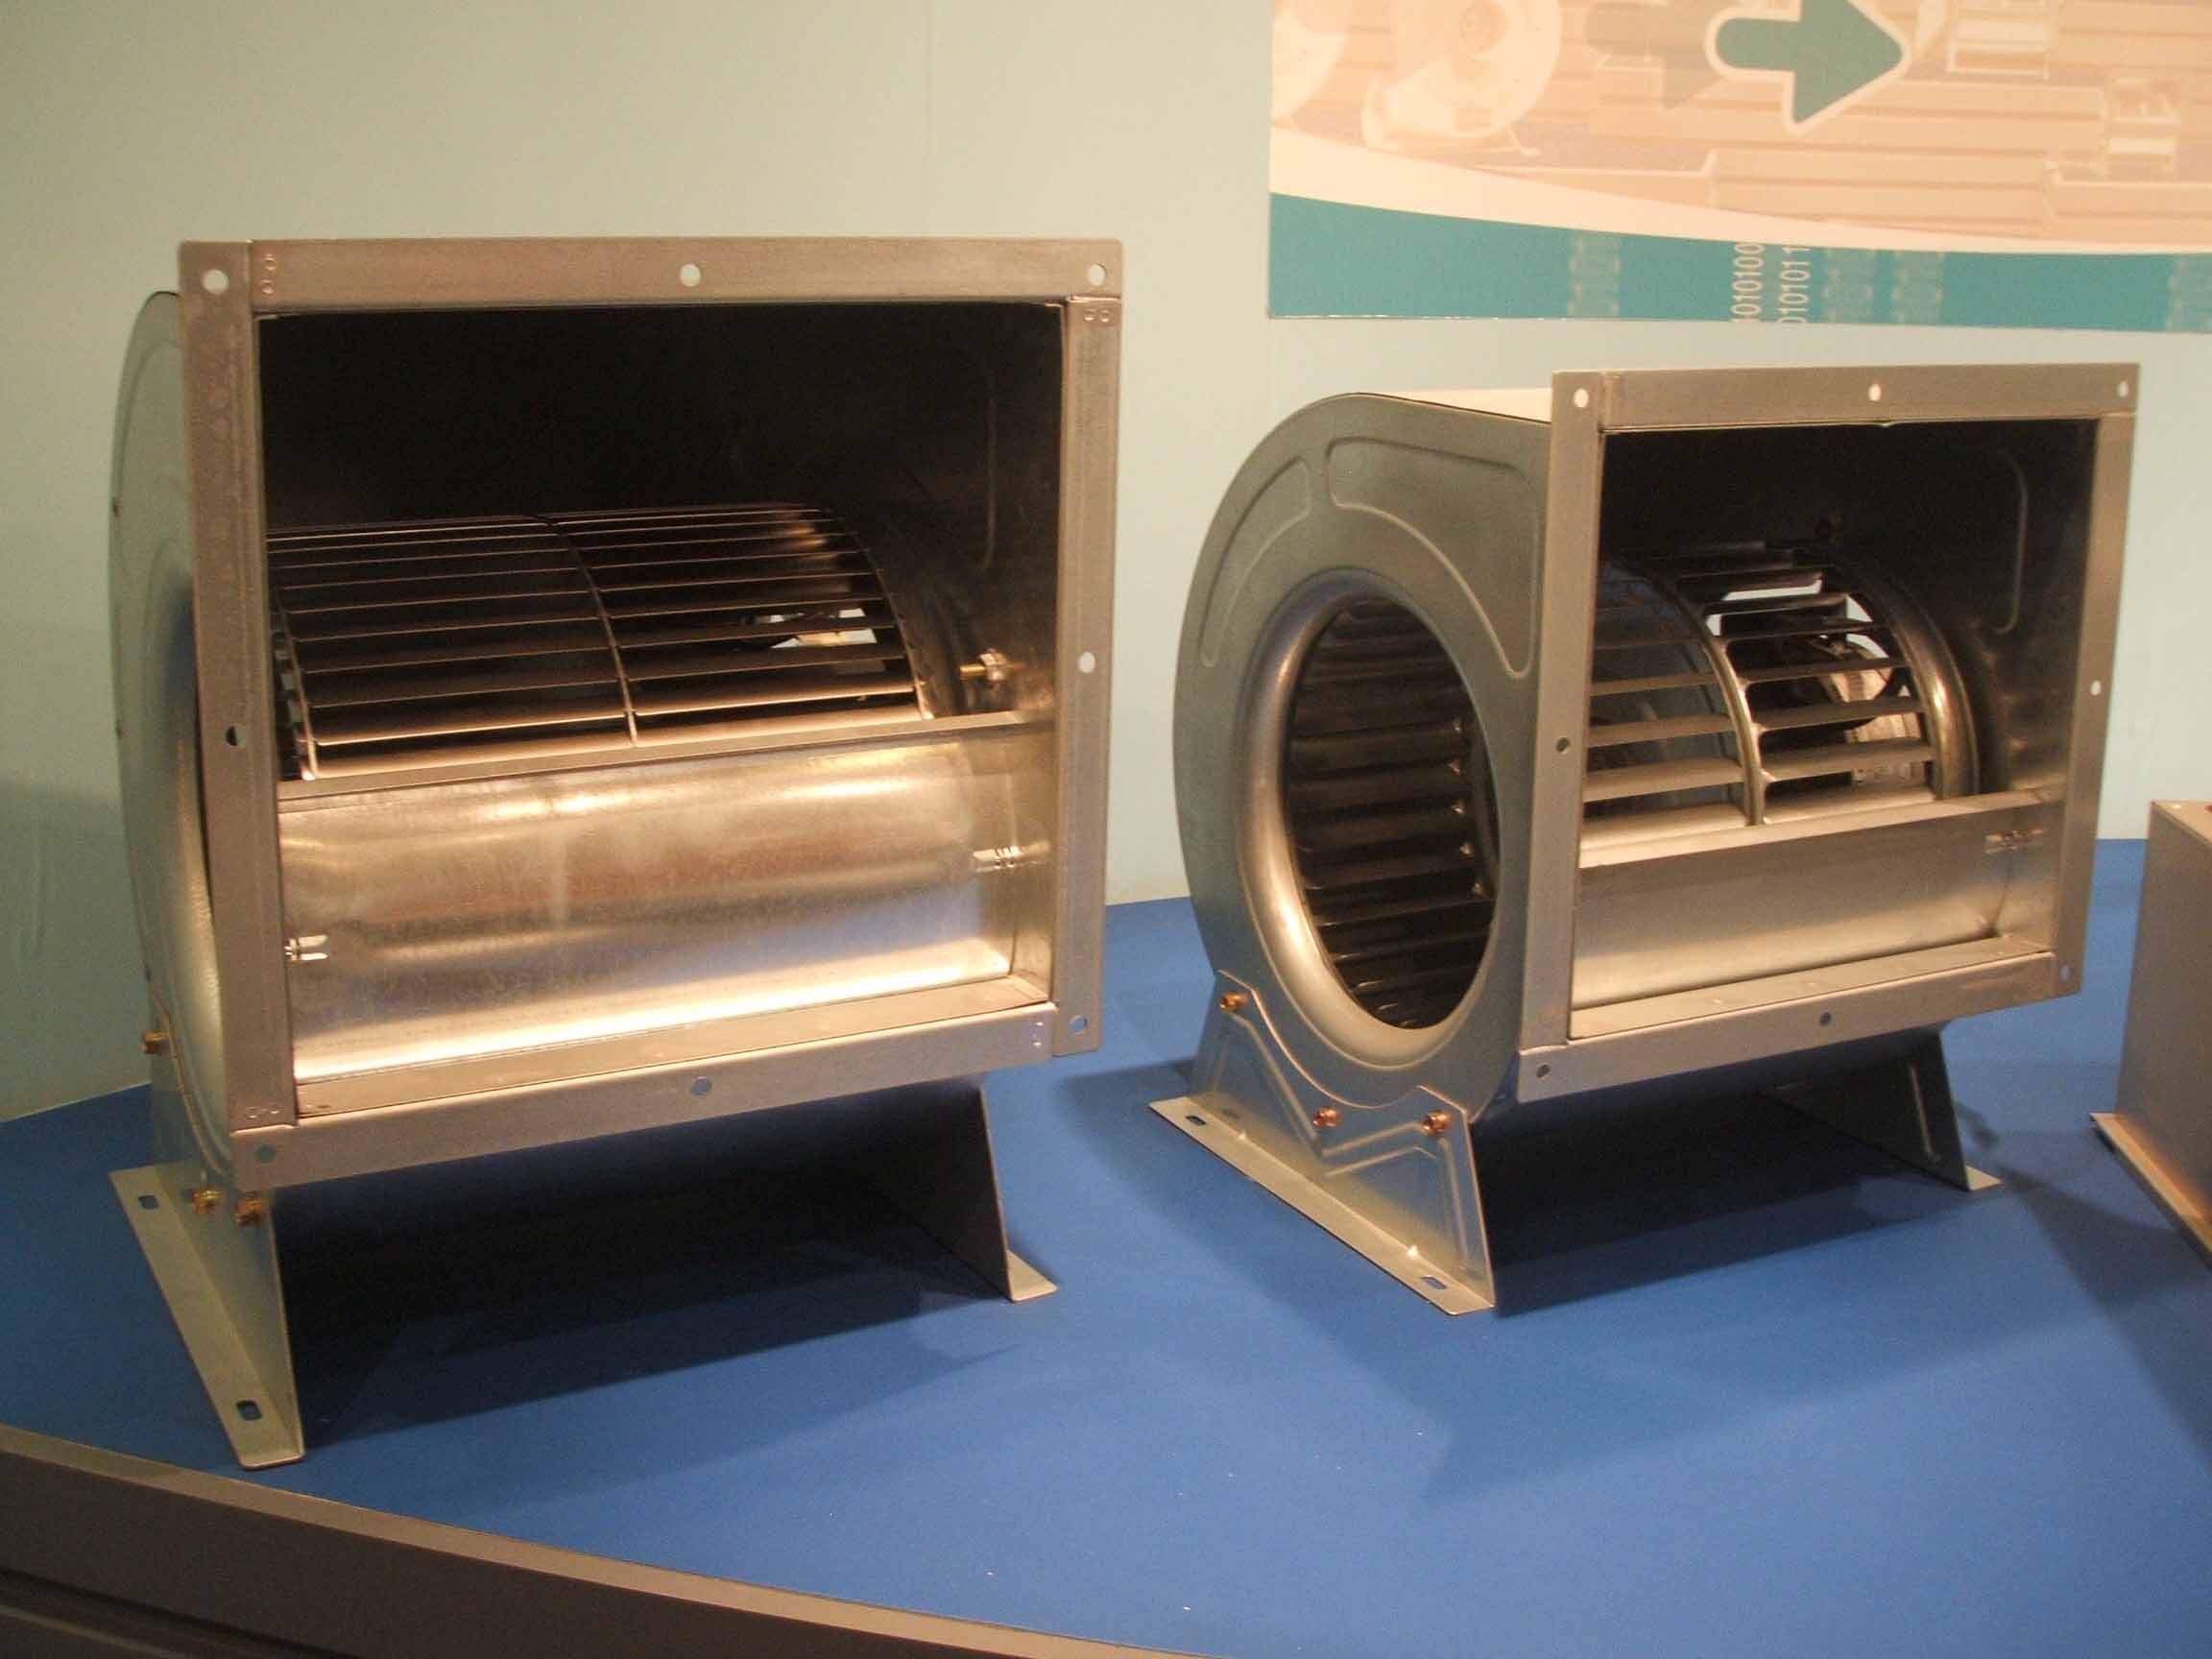 Blower Air Purifier : Blower inlet air filter housing free engine image